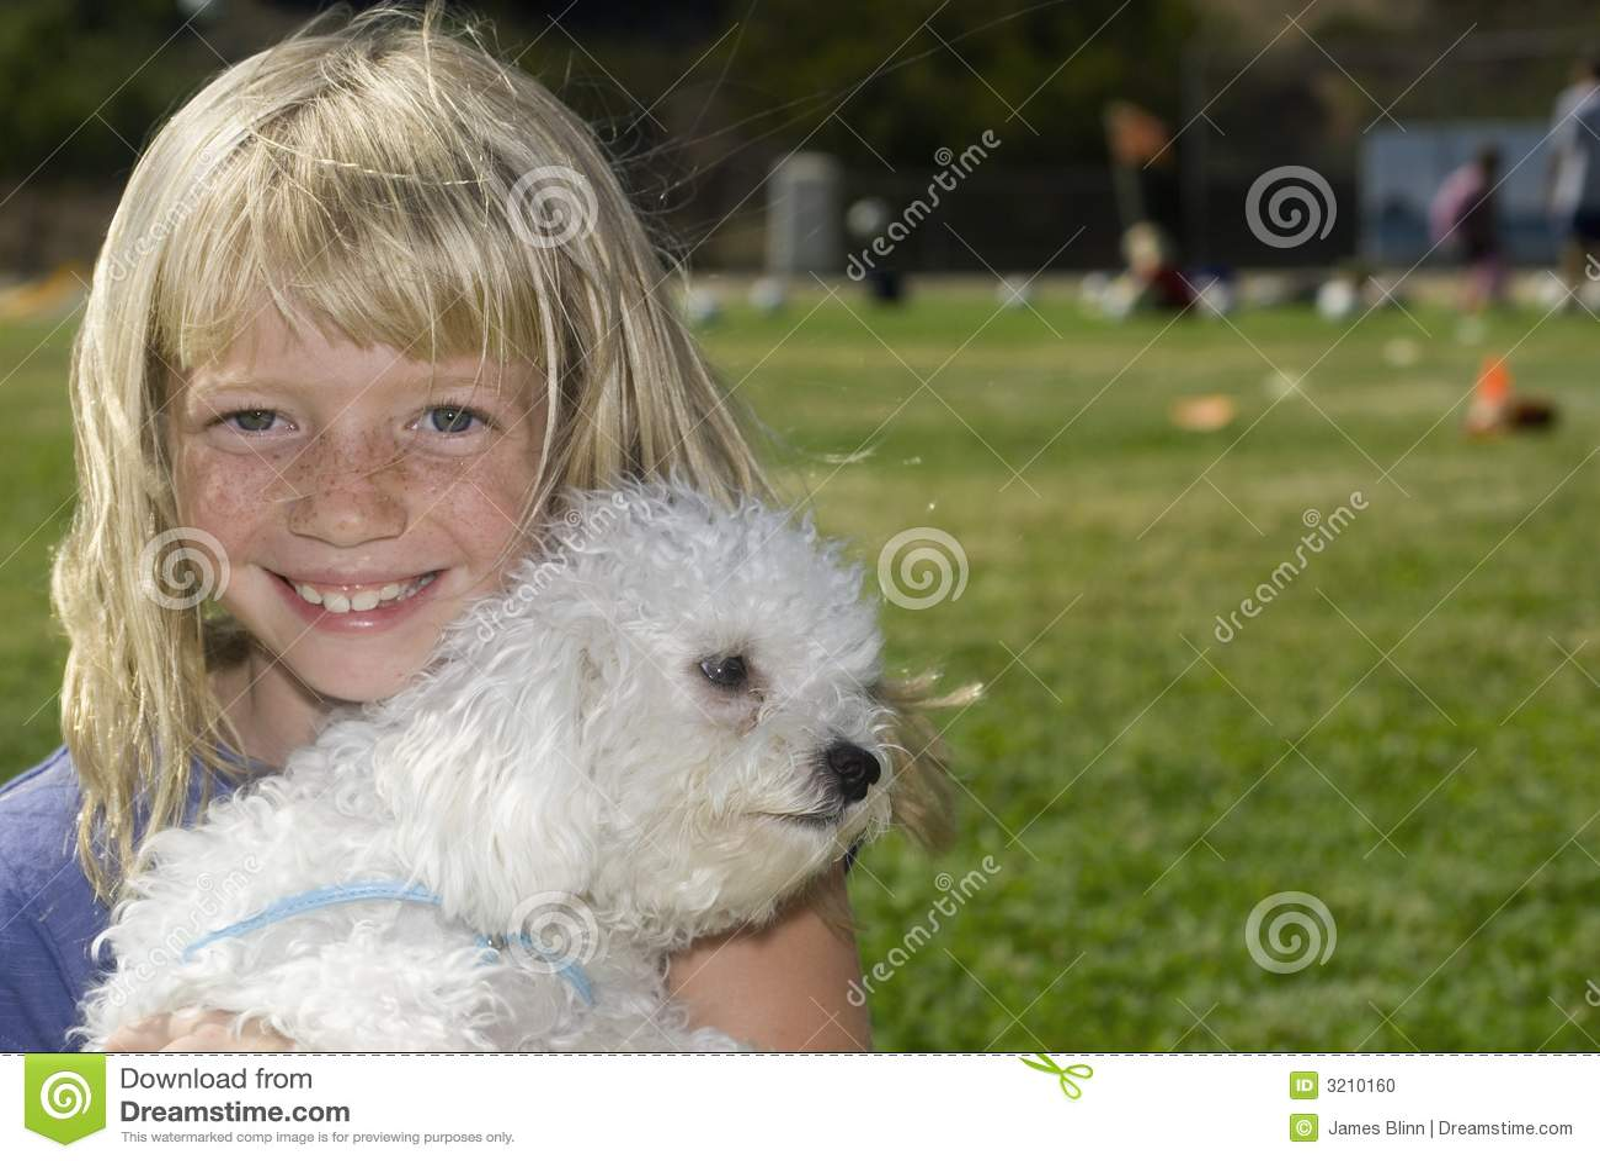 Cute Girl with Best friend